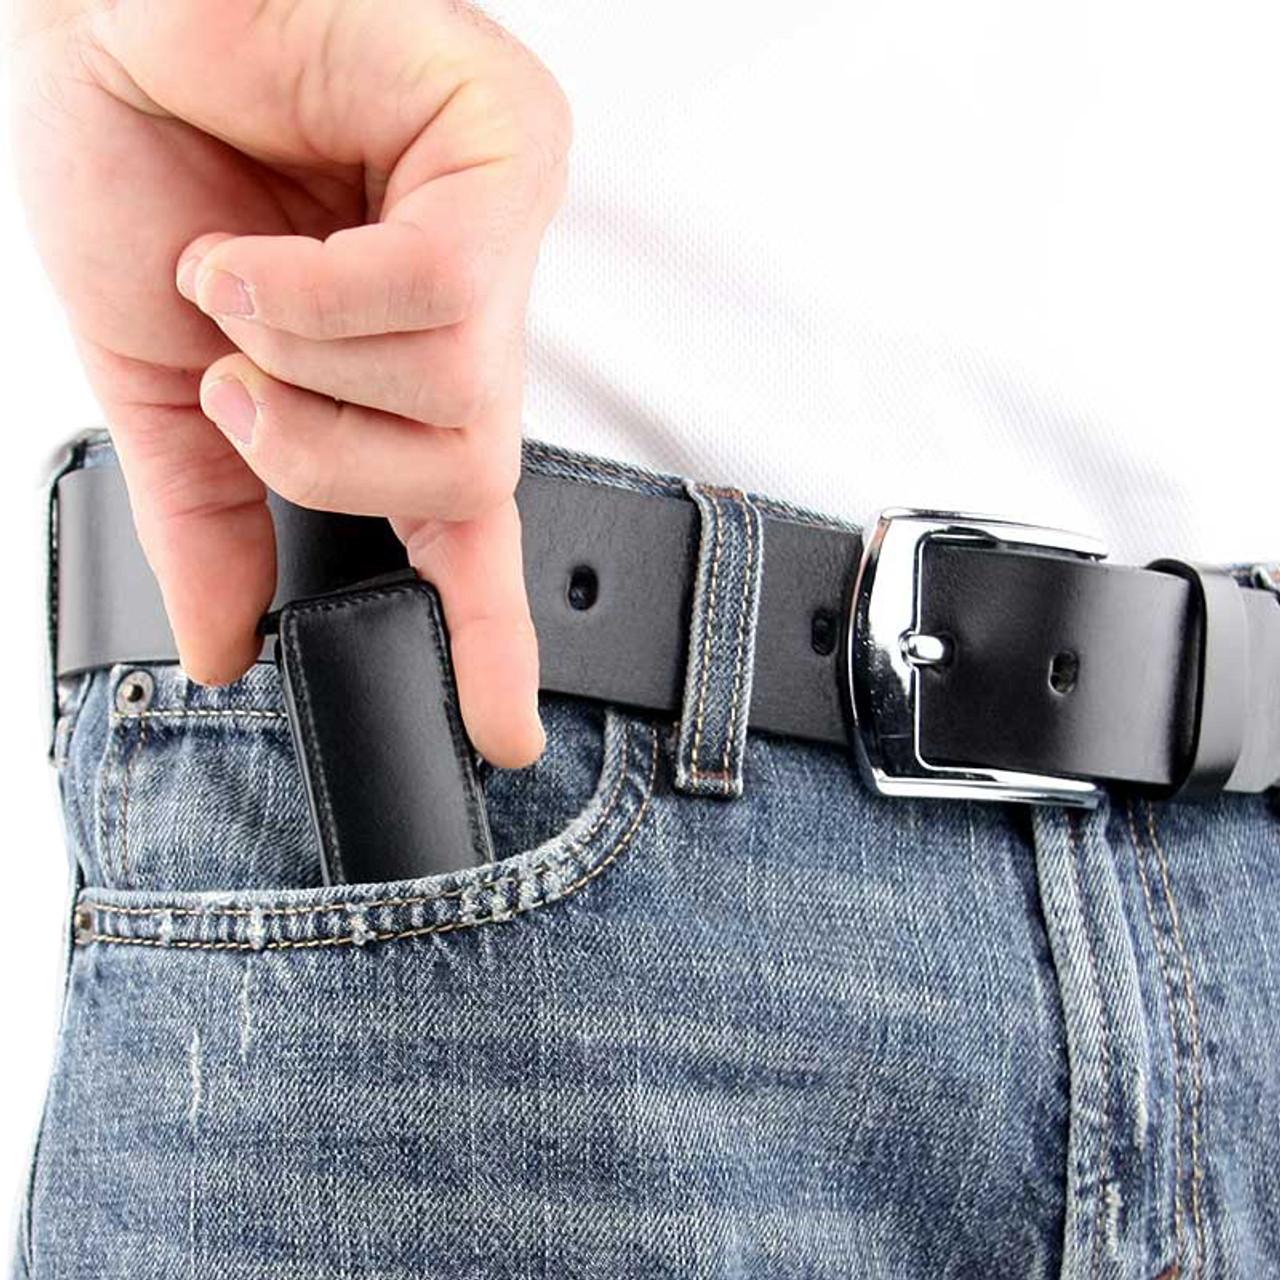 AMT Backup .380 Magazine Pocket Protector